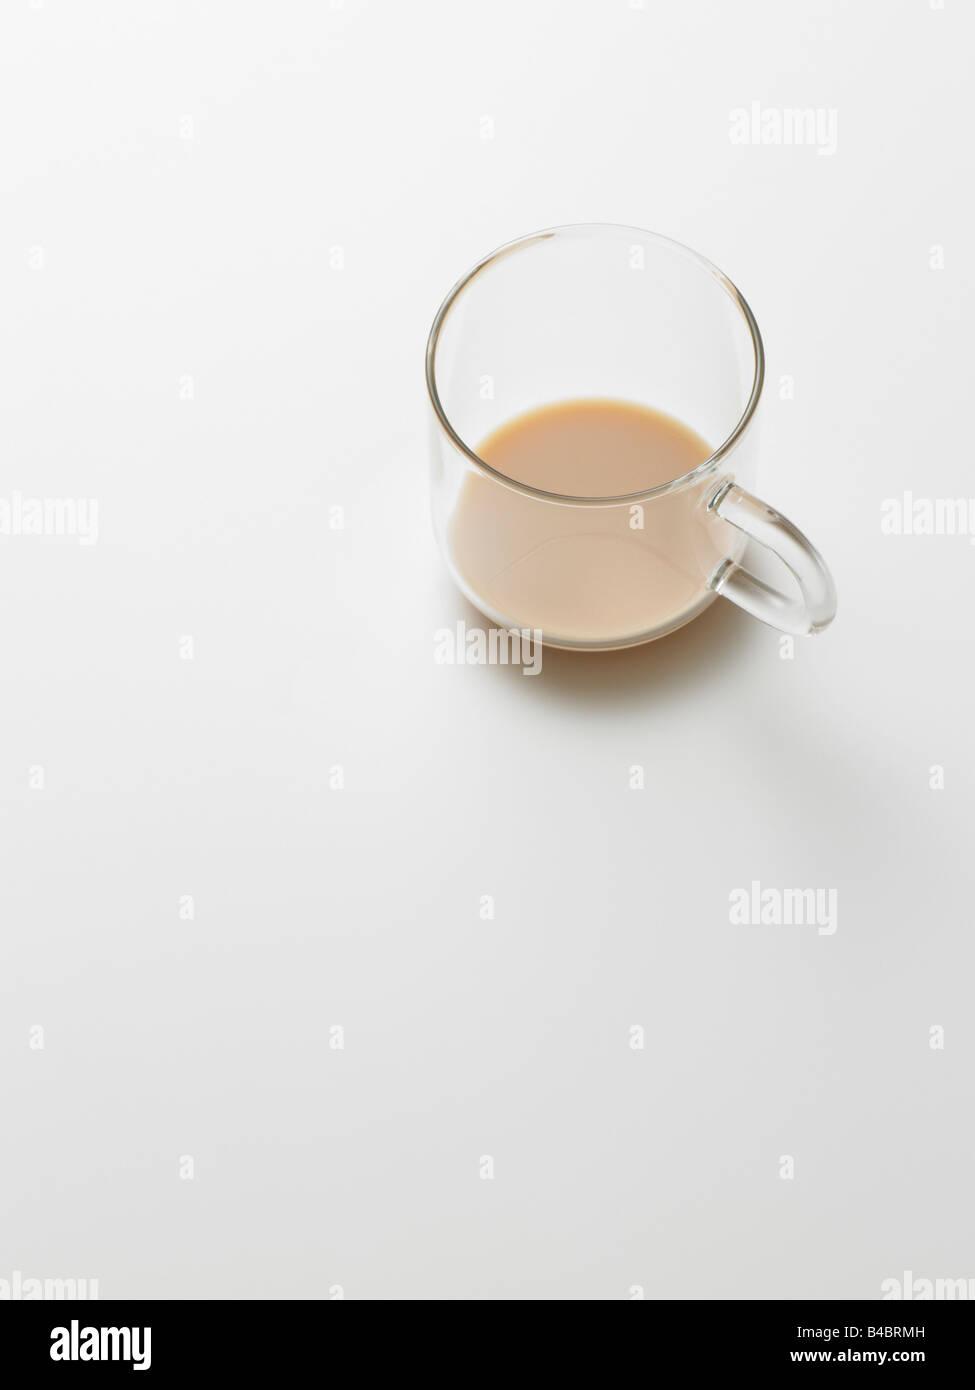 glass tea mug on plain background - Stock Image